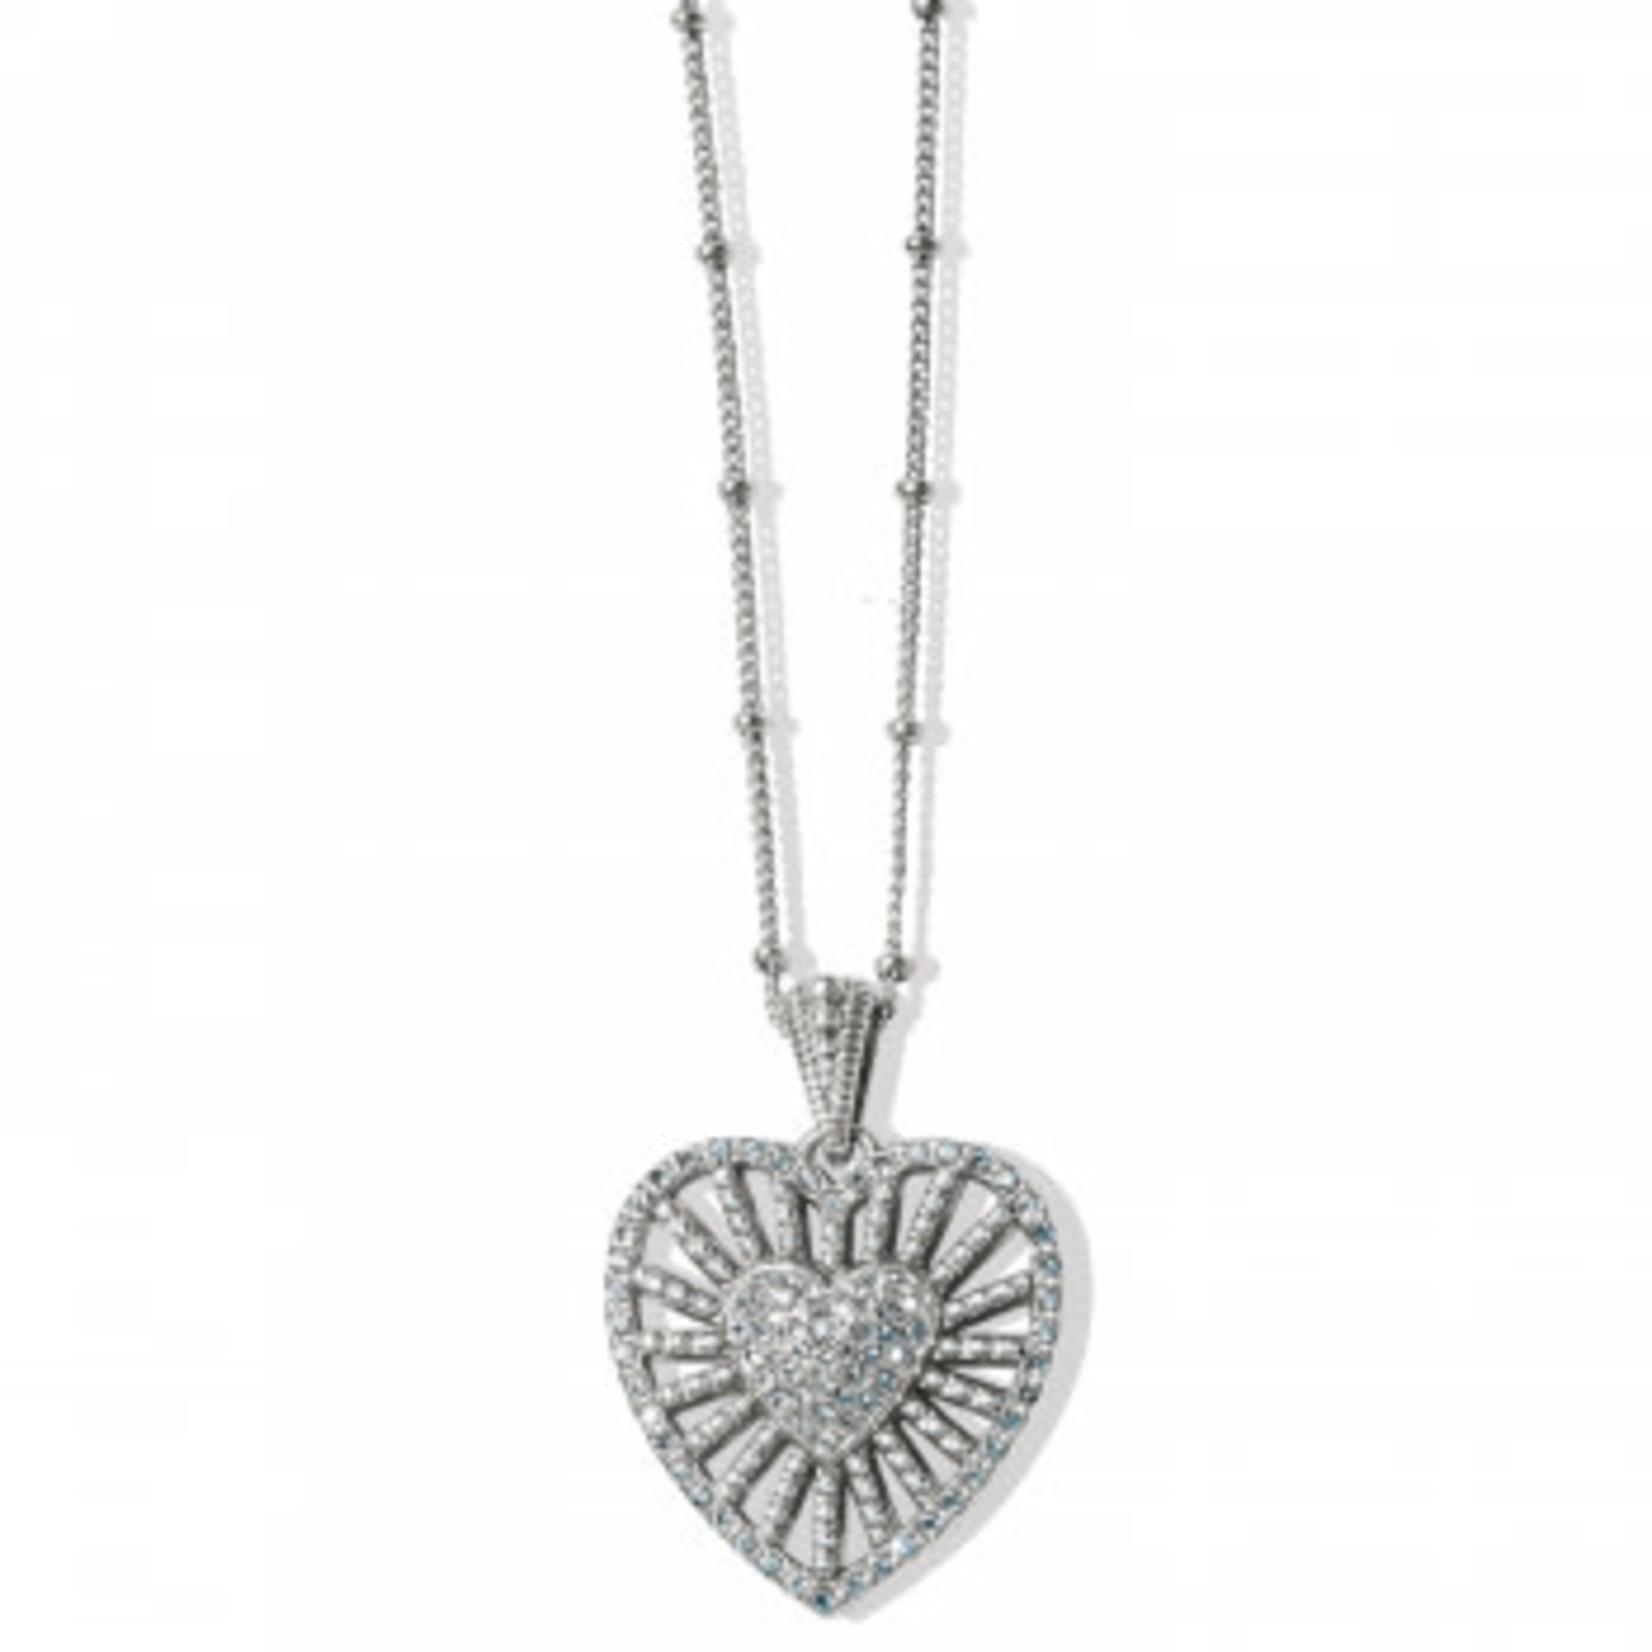 Brighton Illumina Heart Burst Necklace - Silver